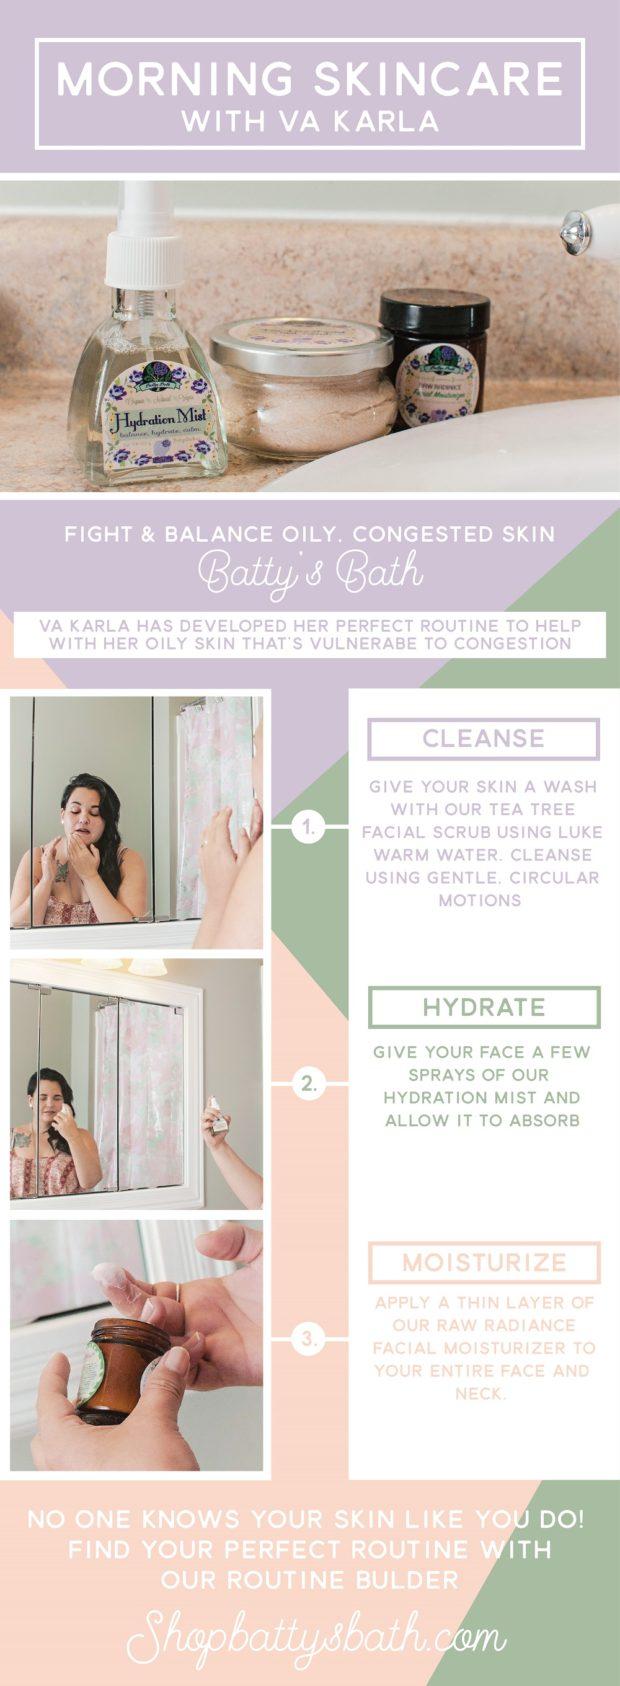 Morning skin care routine for VA Karla who